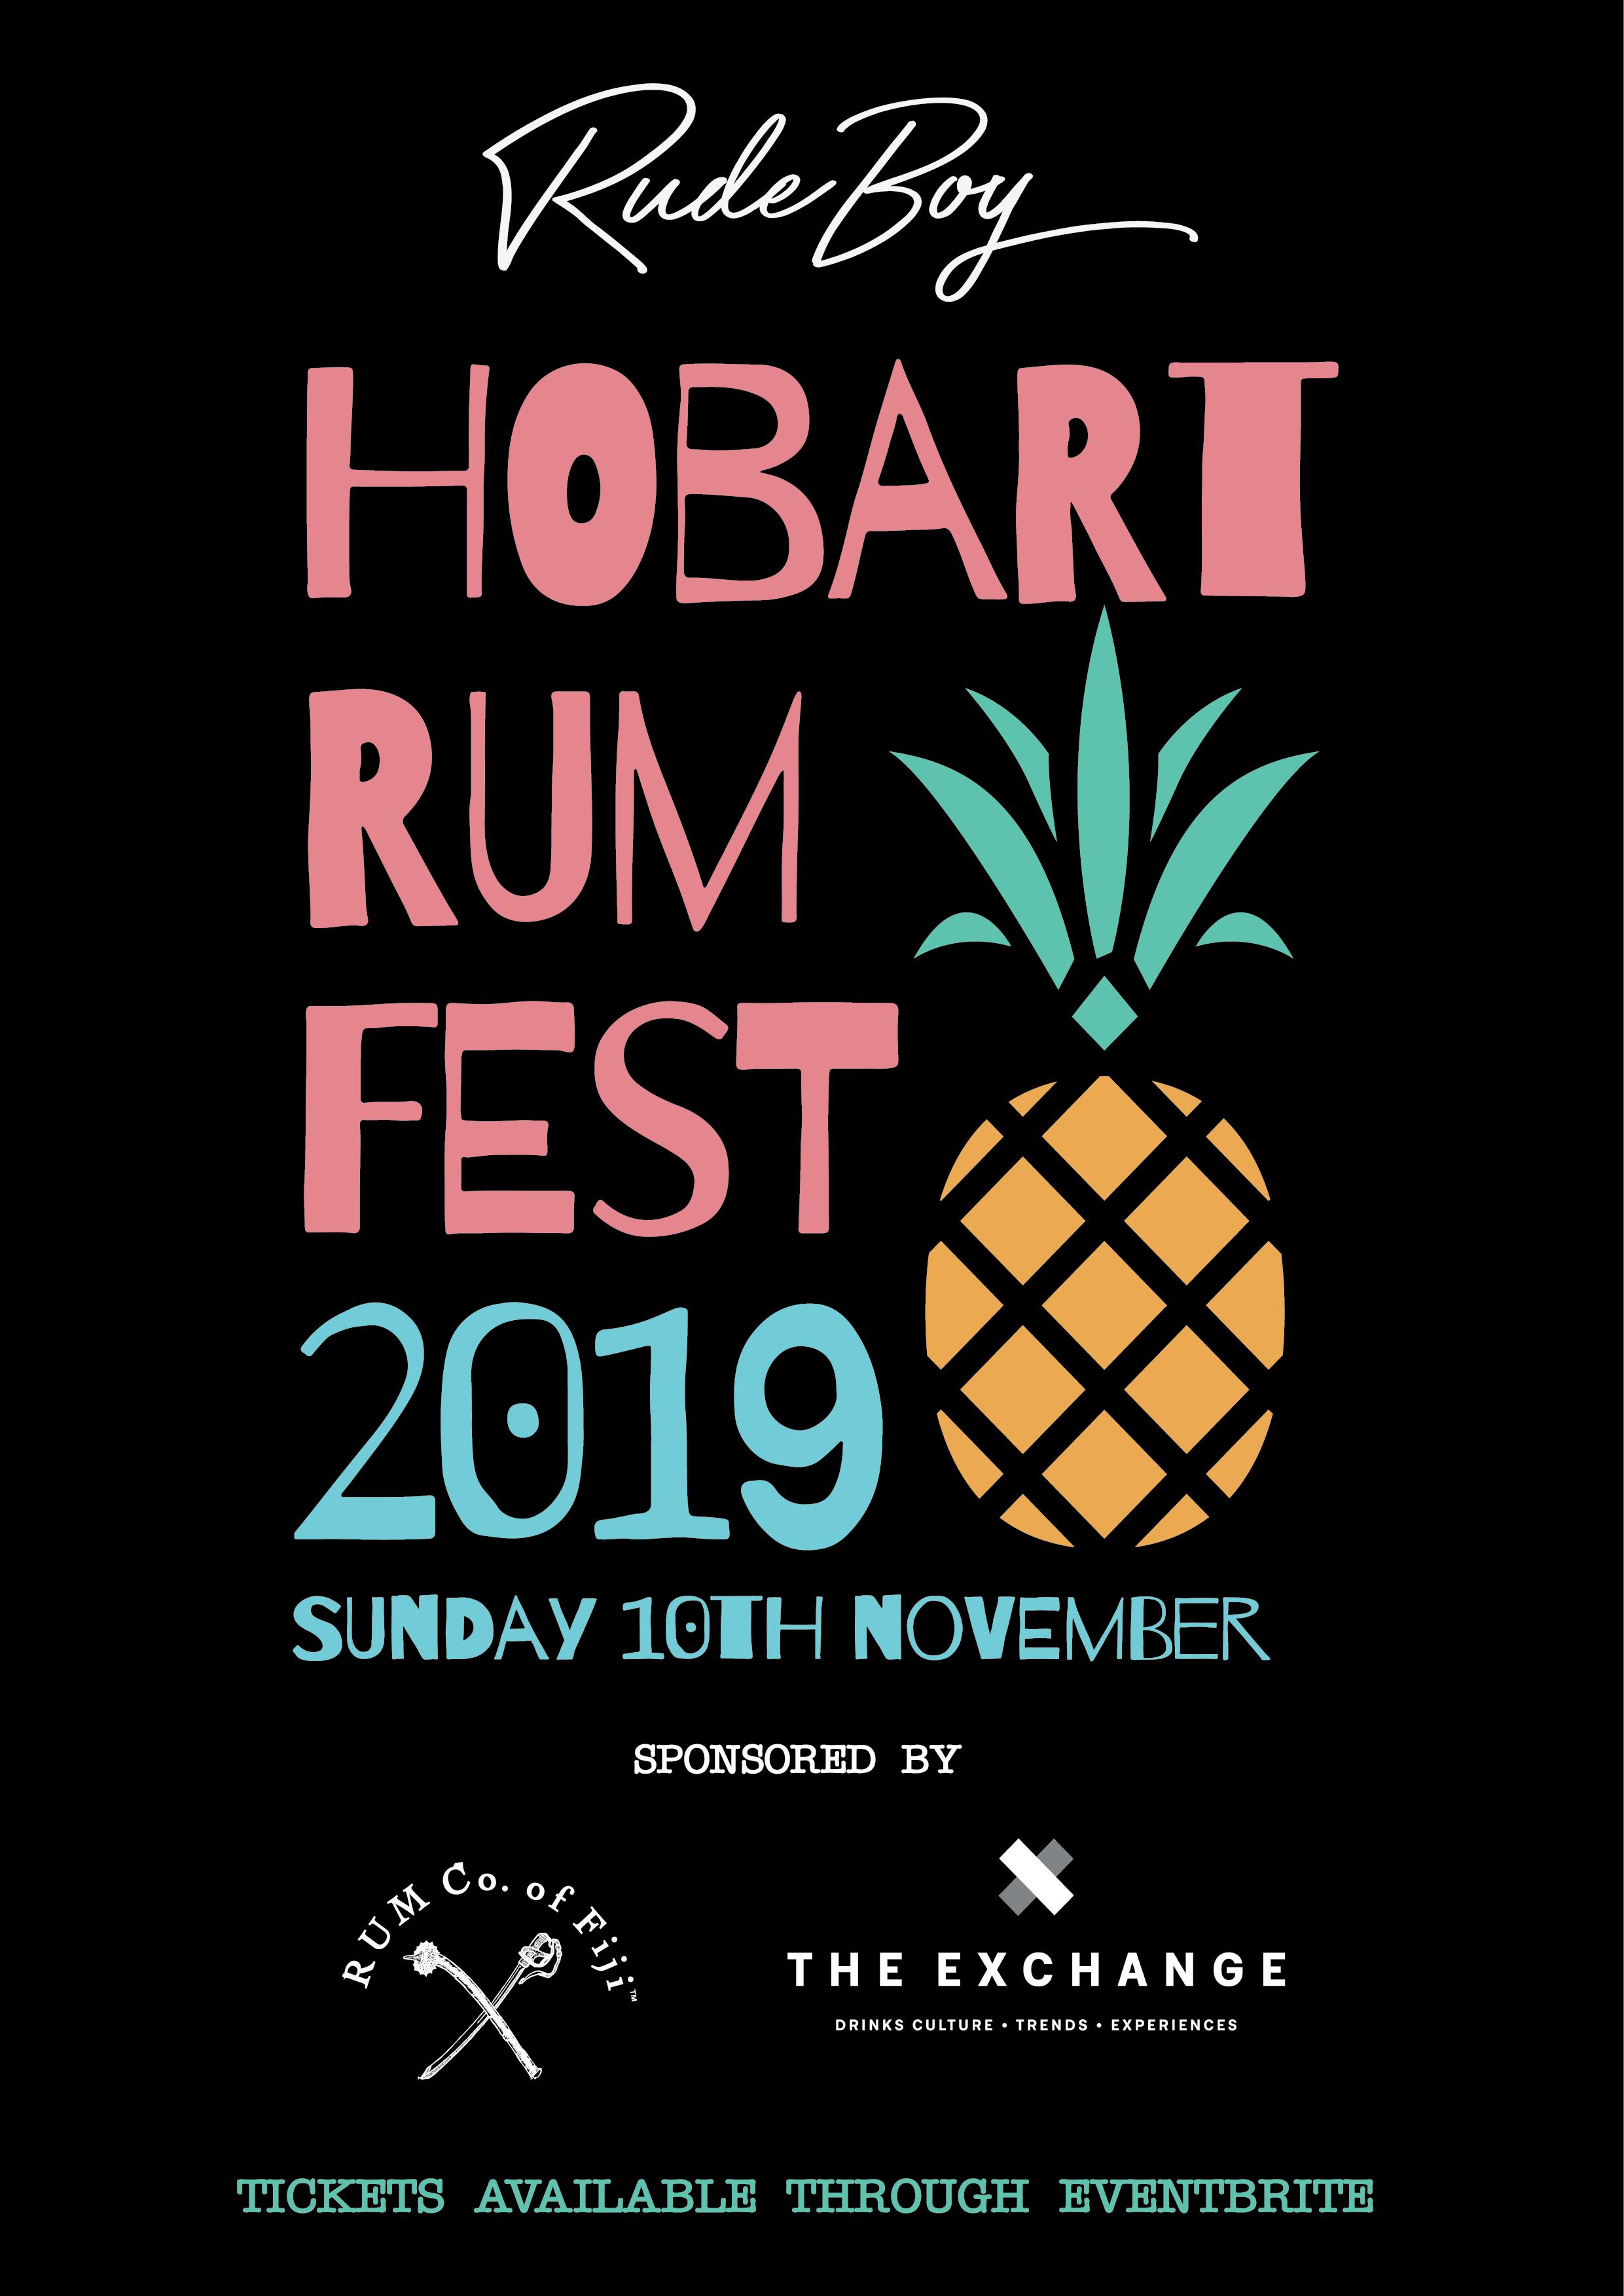 Hobart Rum Fest FINAL POSTER 5.9.19-01.png